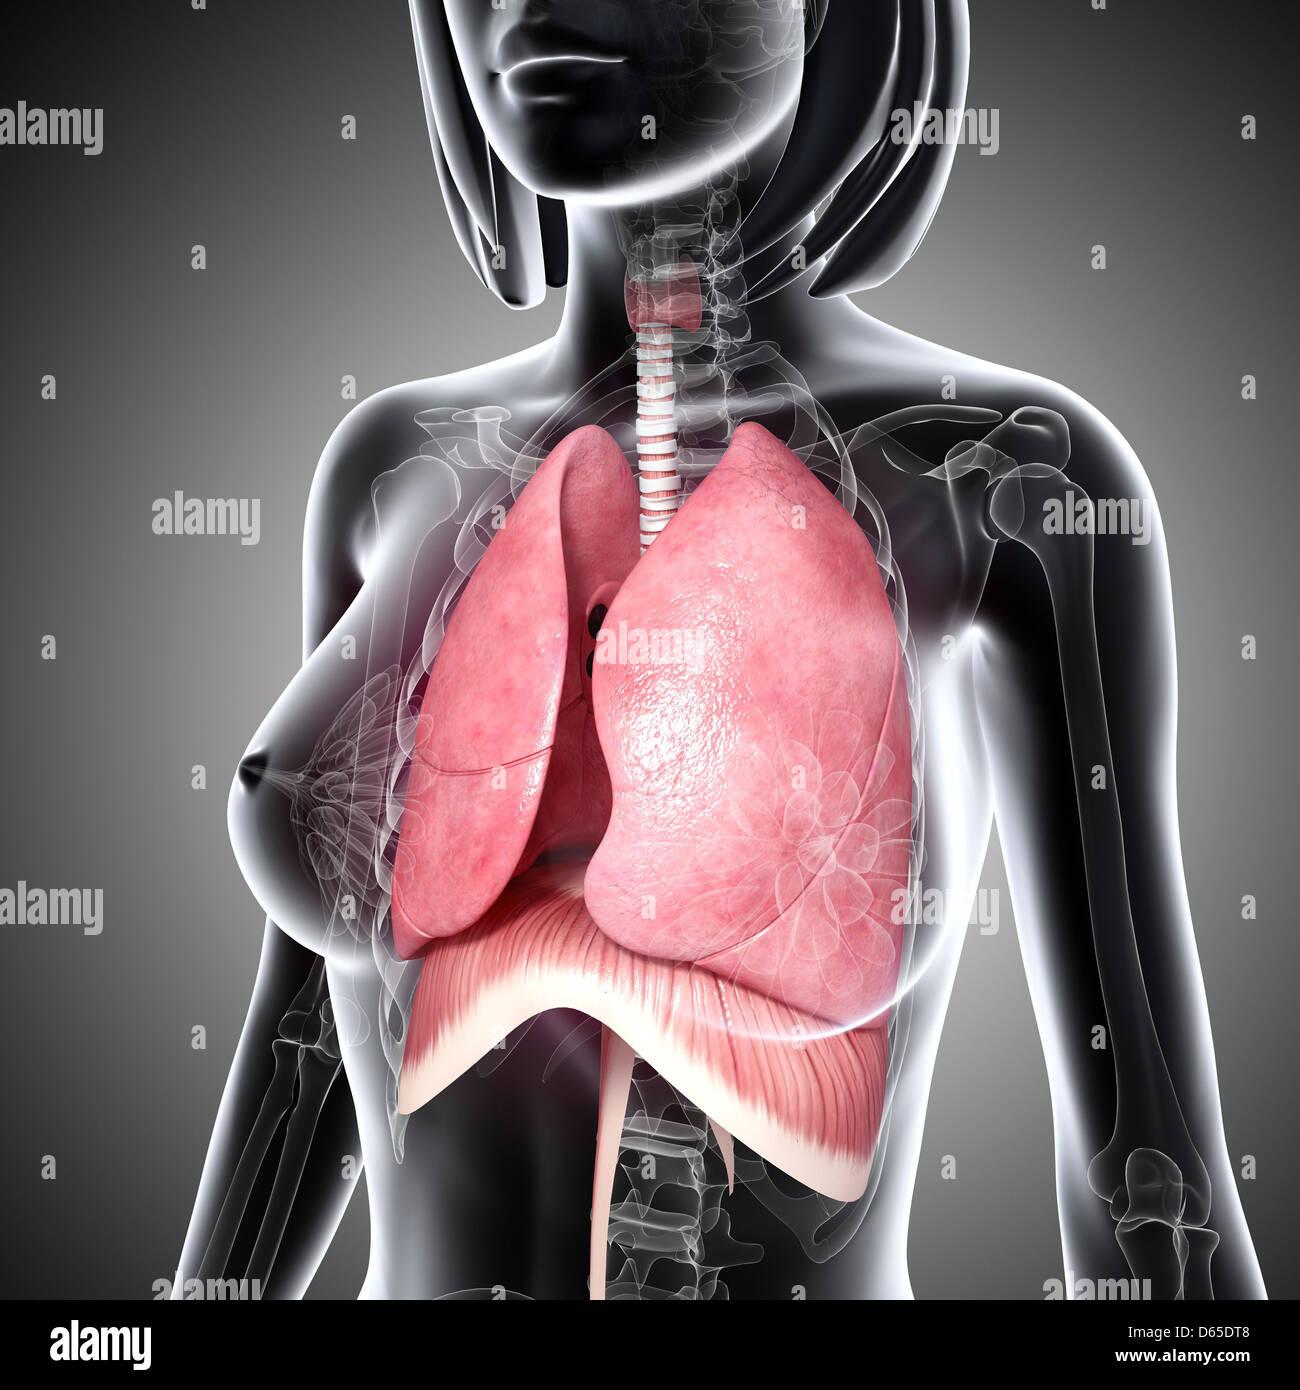 Organ Of The Respiratory System Stock Photos & Organ Of The ...